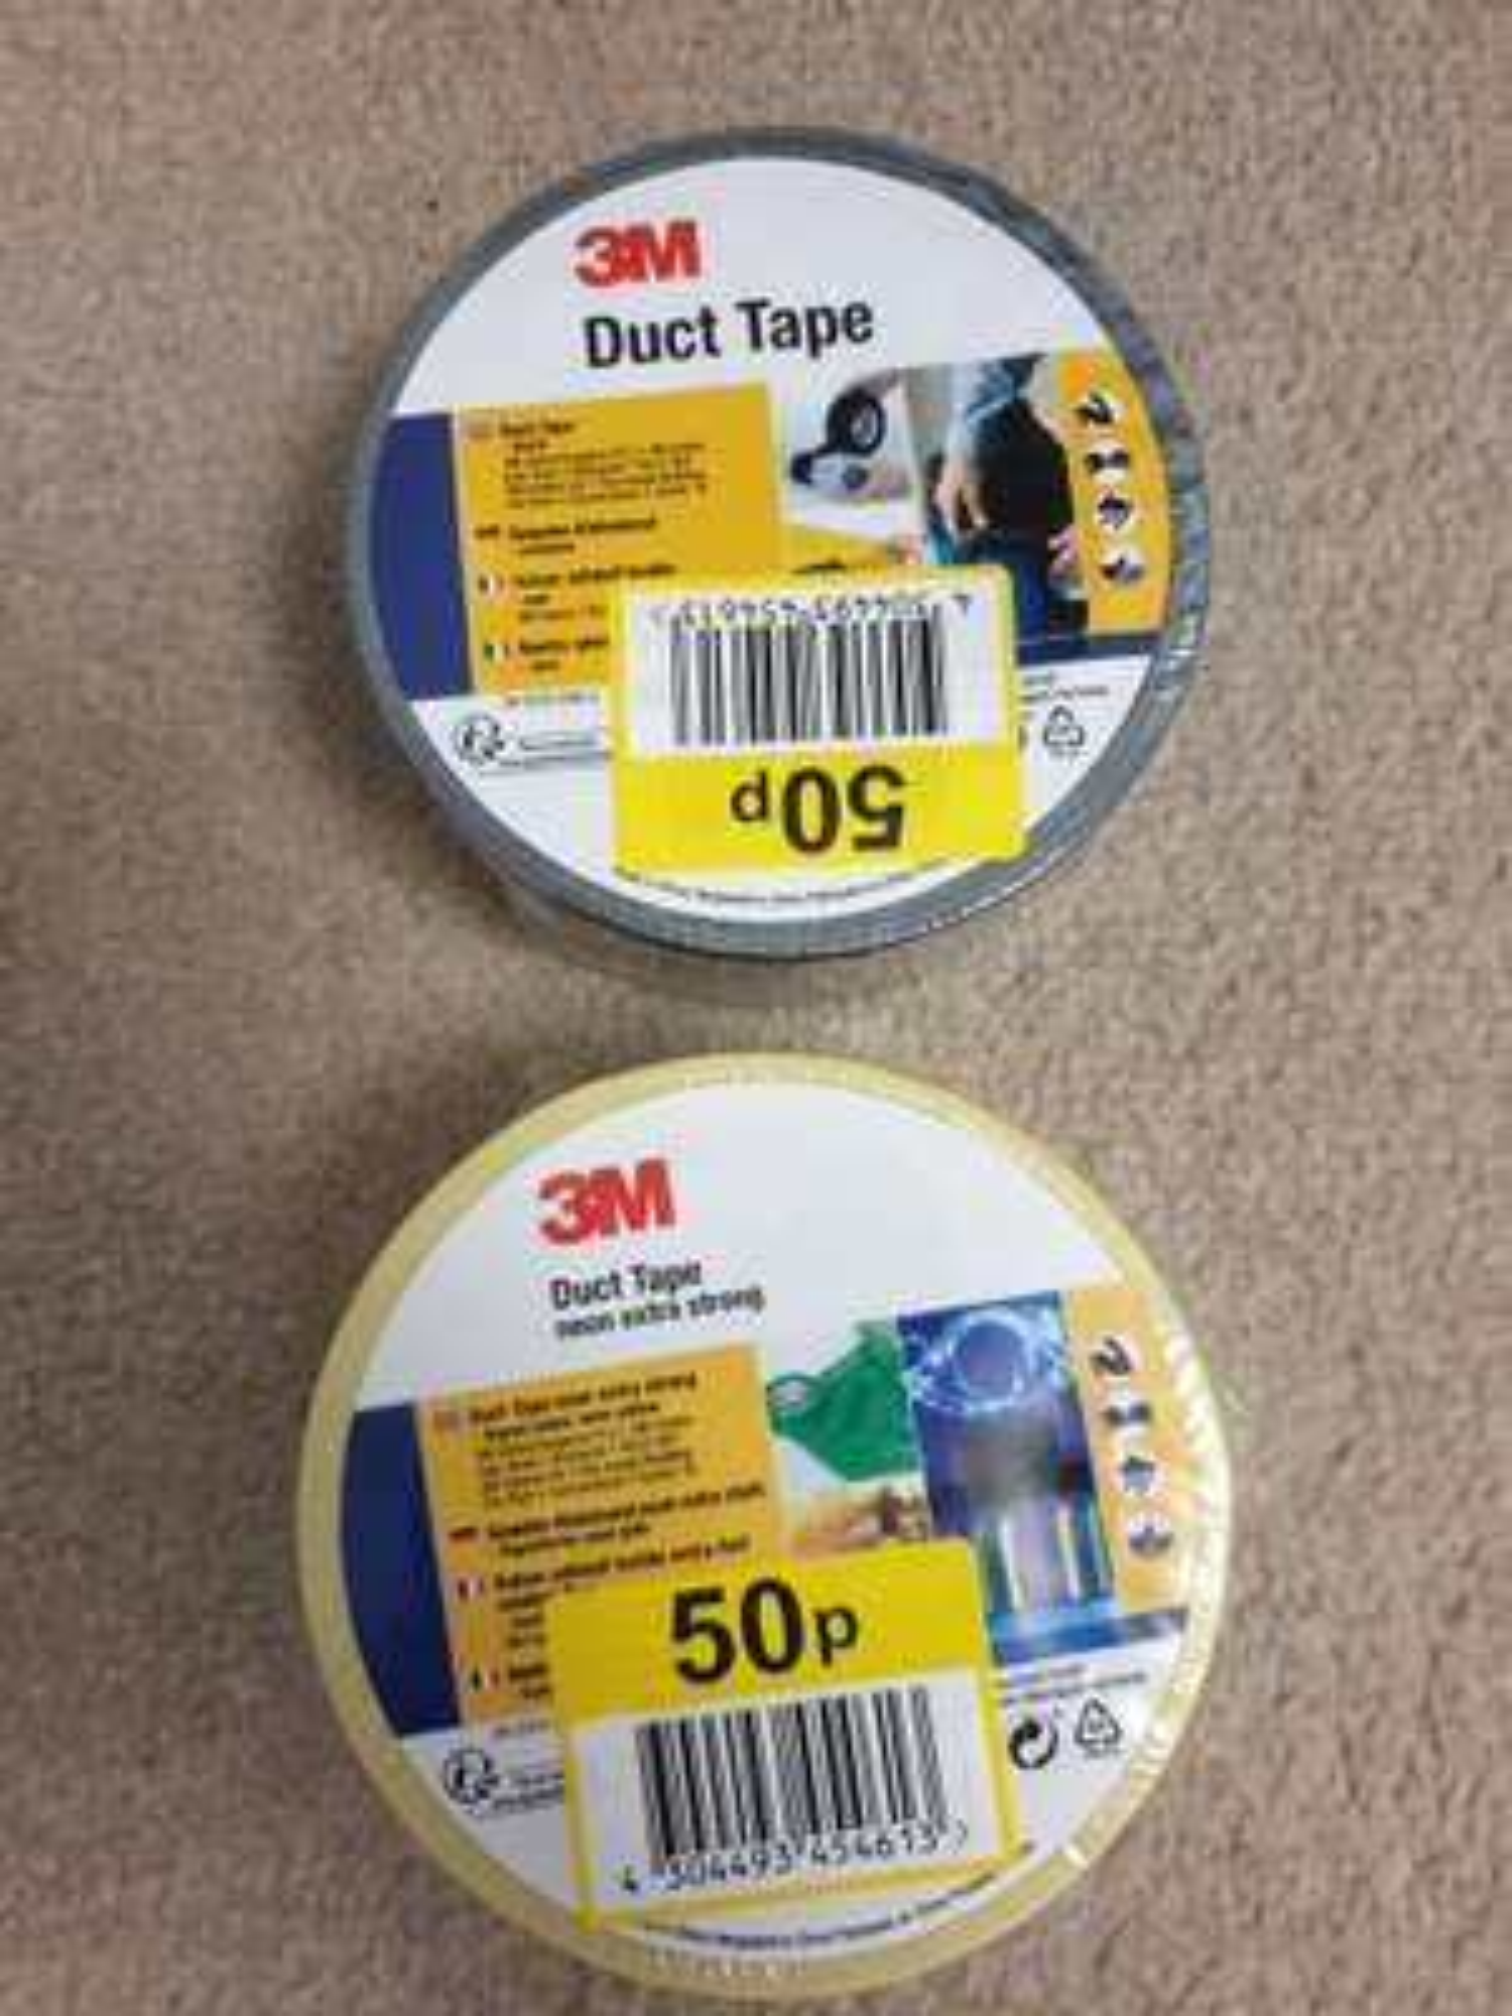 3M duct tape down 50p @ Lidl (Dewsbury)